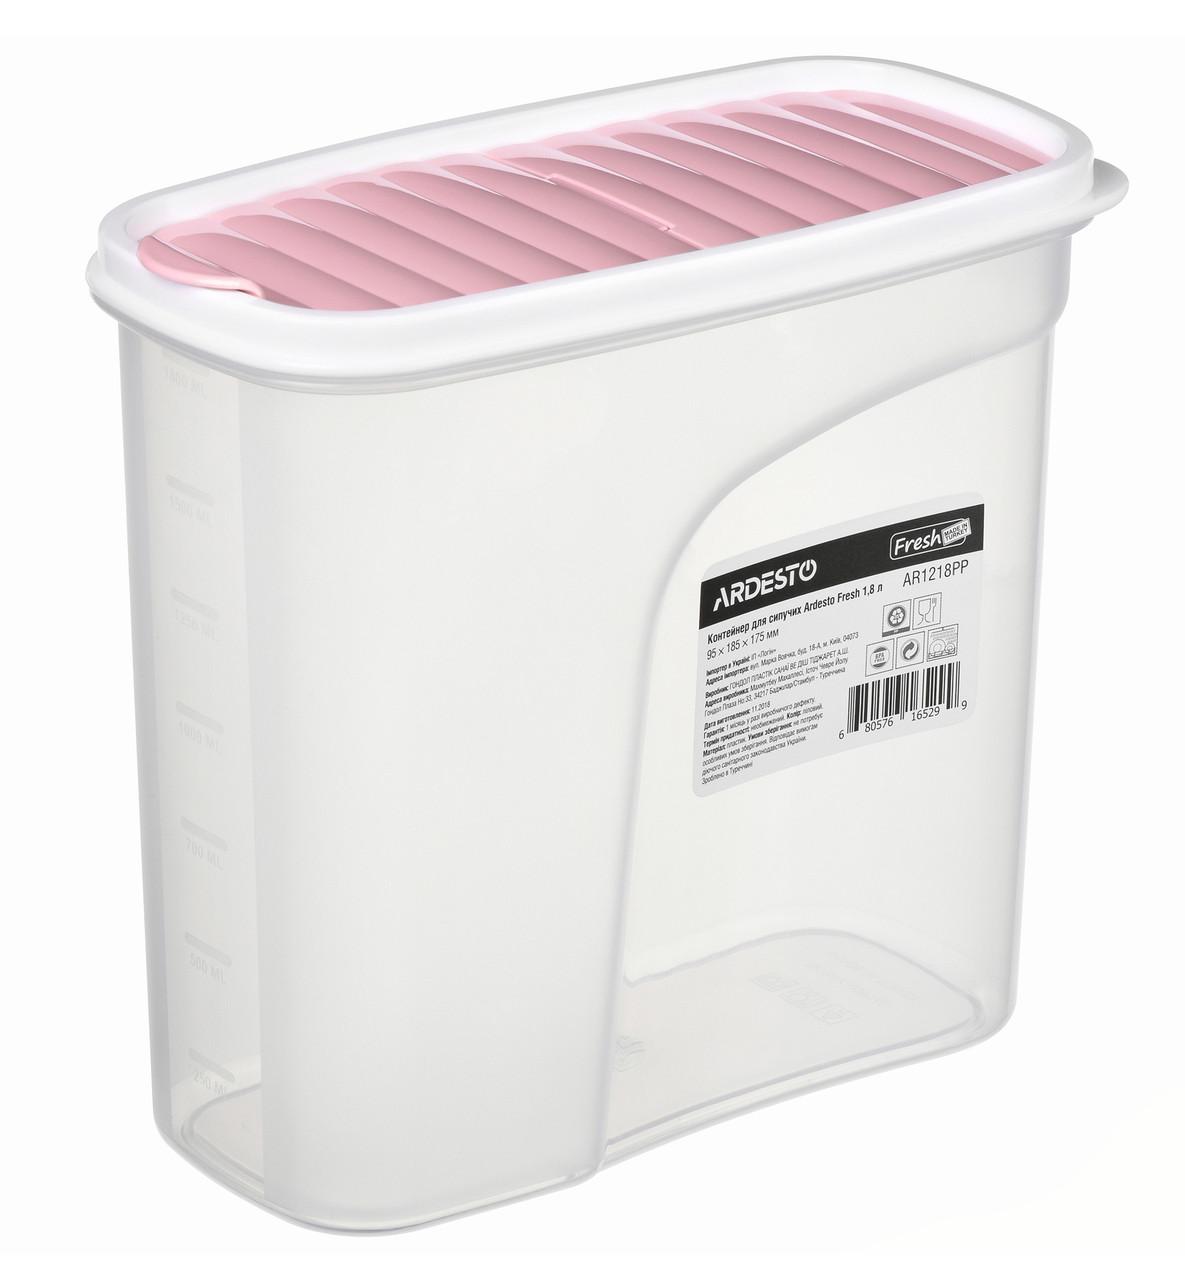 Контейнер для сыпучих Ardesto Fresh 1.8 л Прозрачный пластик / Розовый (AR1218PP)